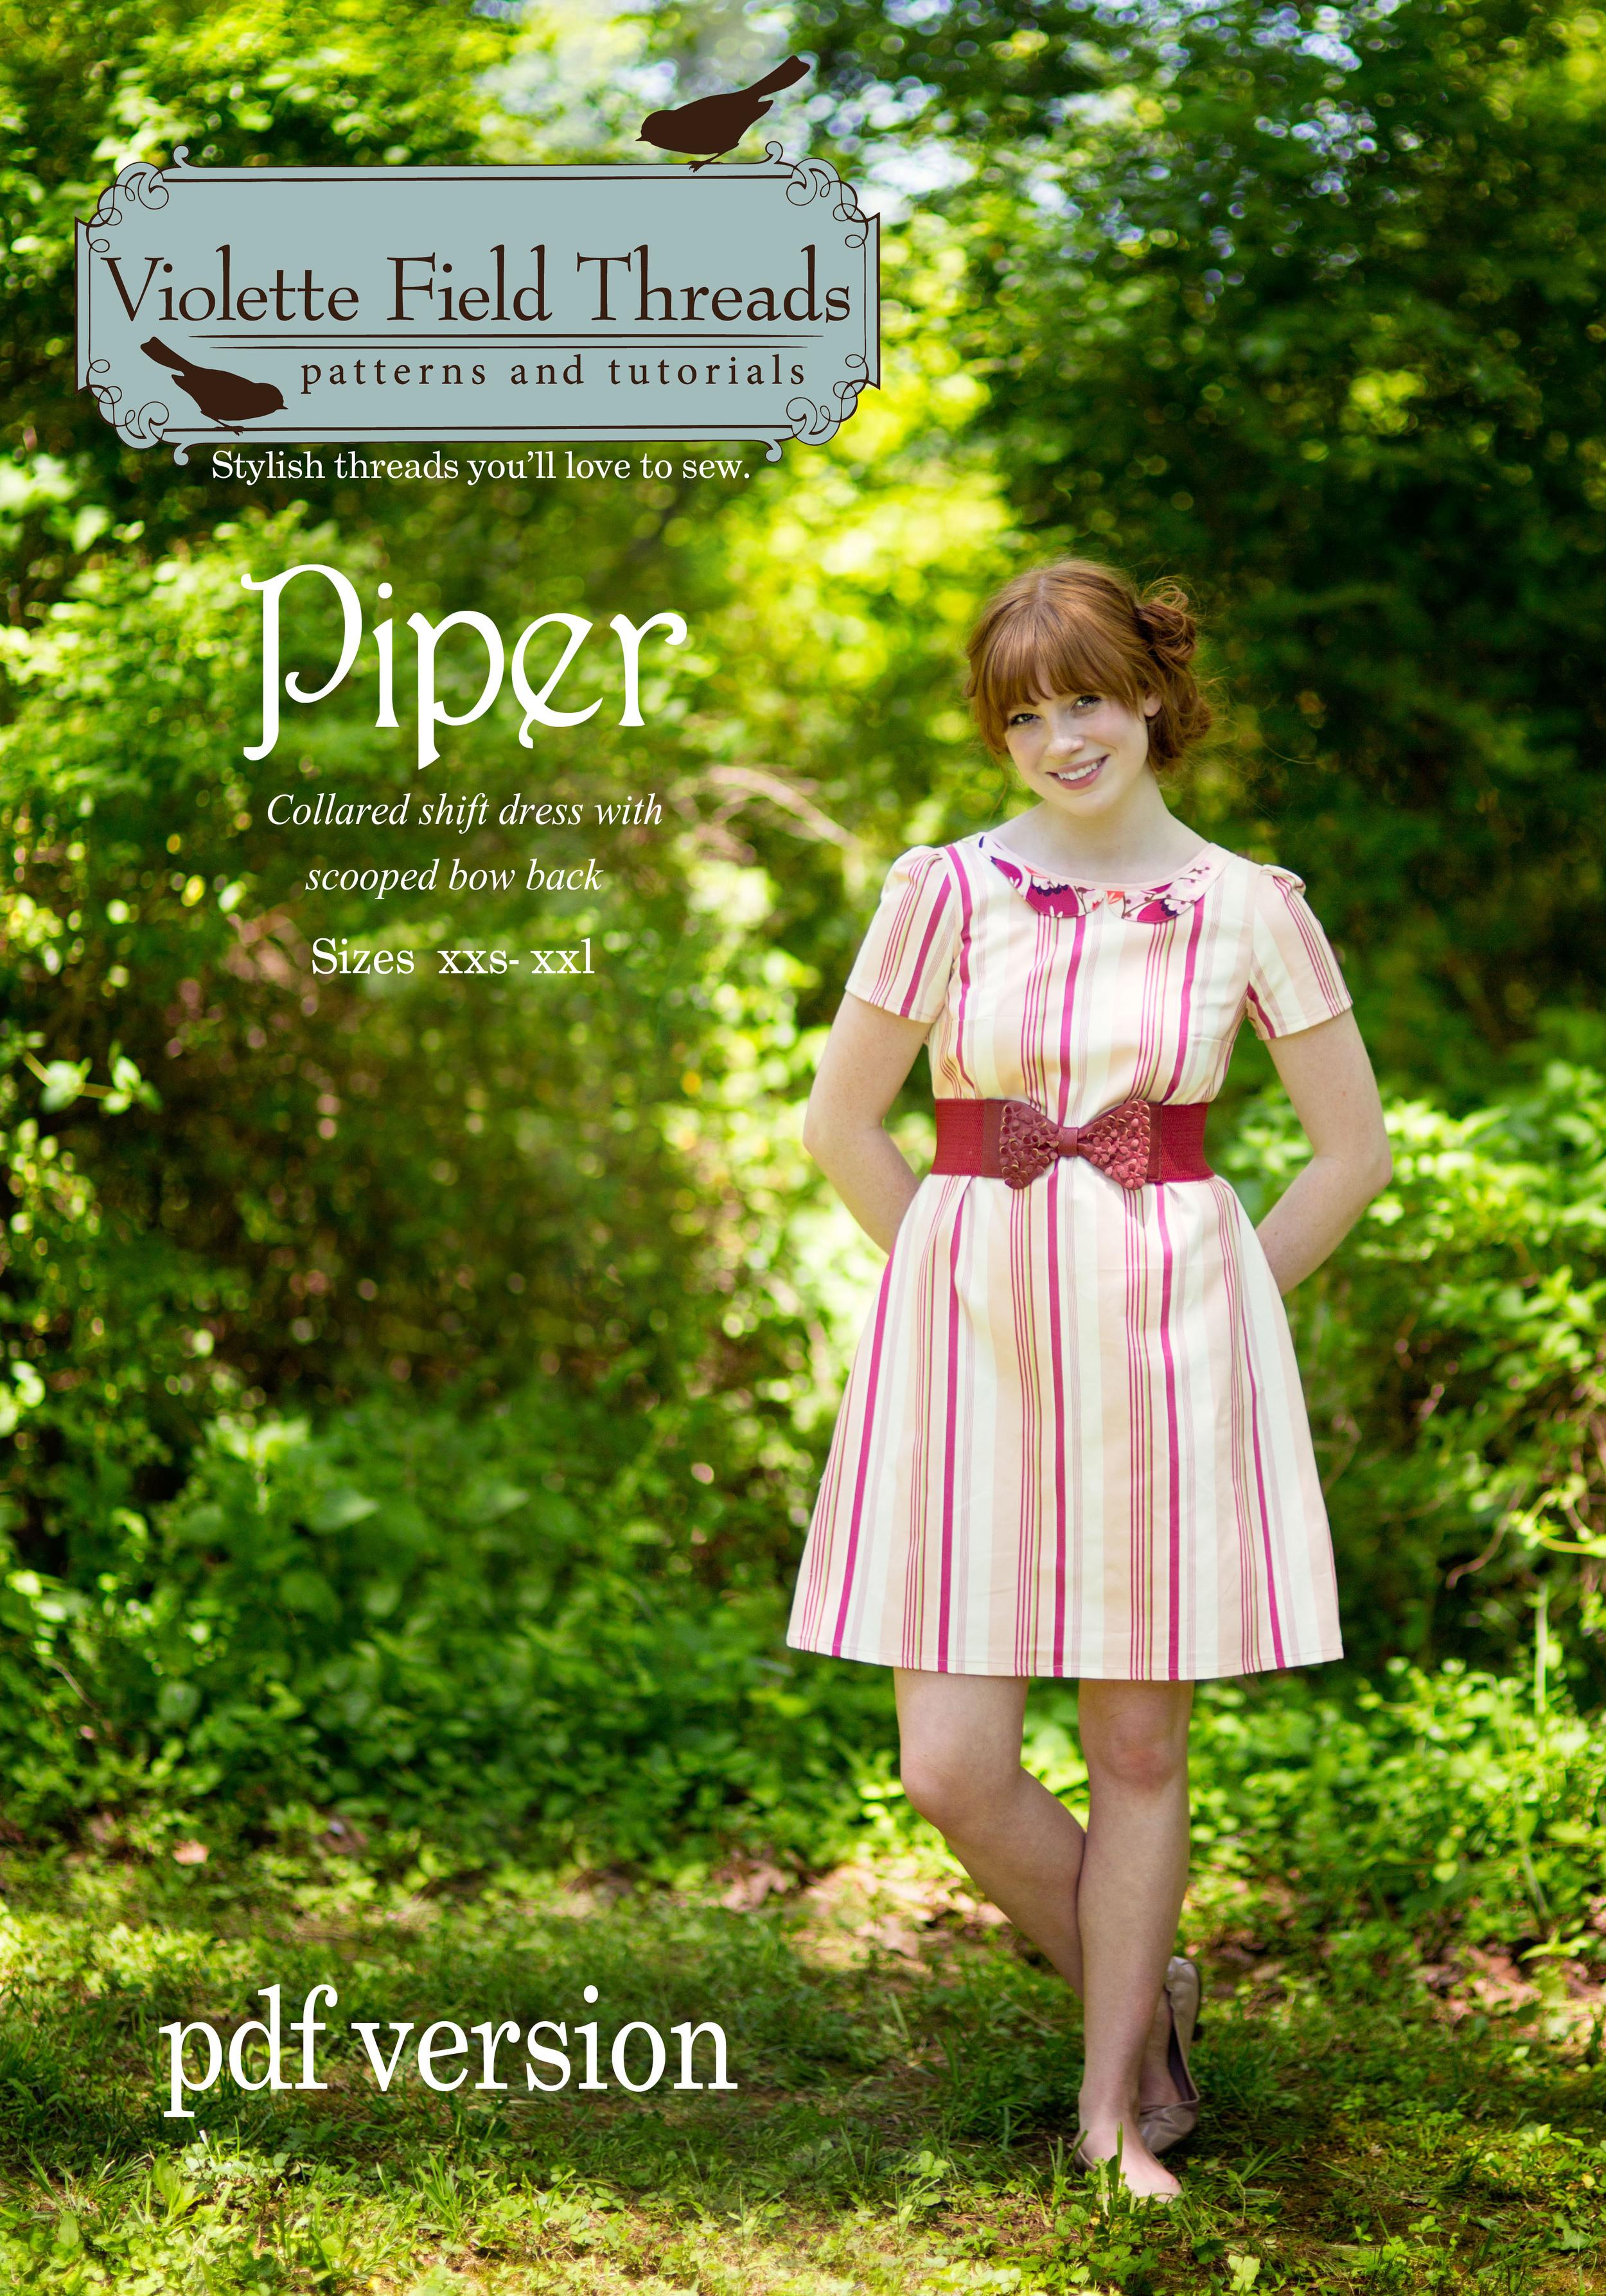 piper PDF cover.jpg